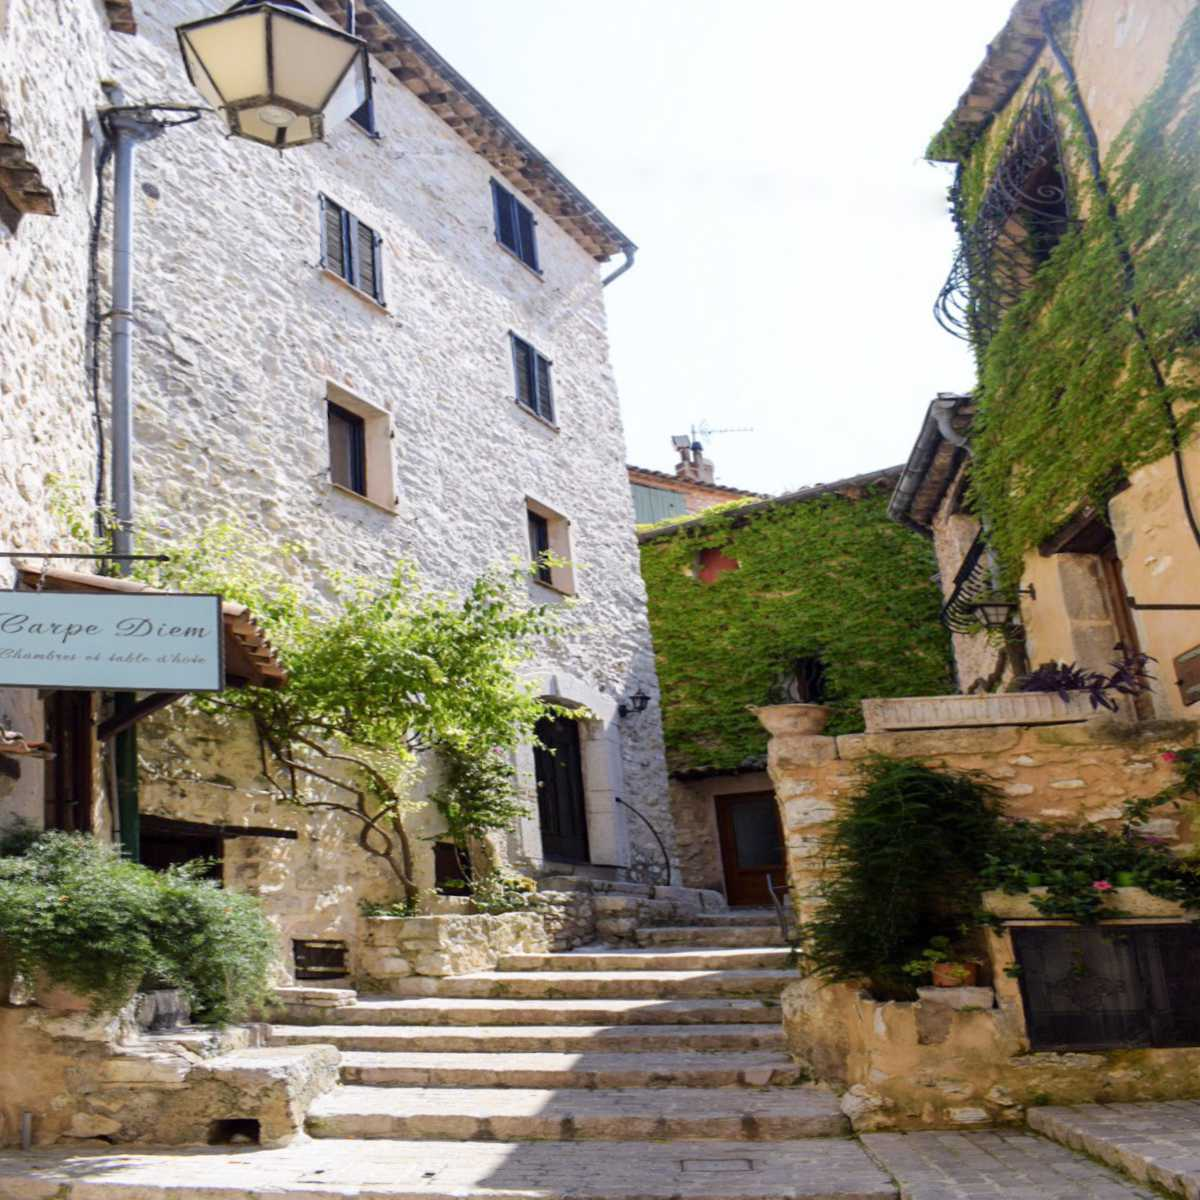 Visiting the Medieval Village of Tourrettes-Sur-Loup, France